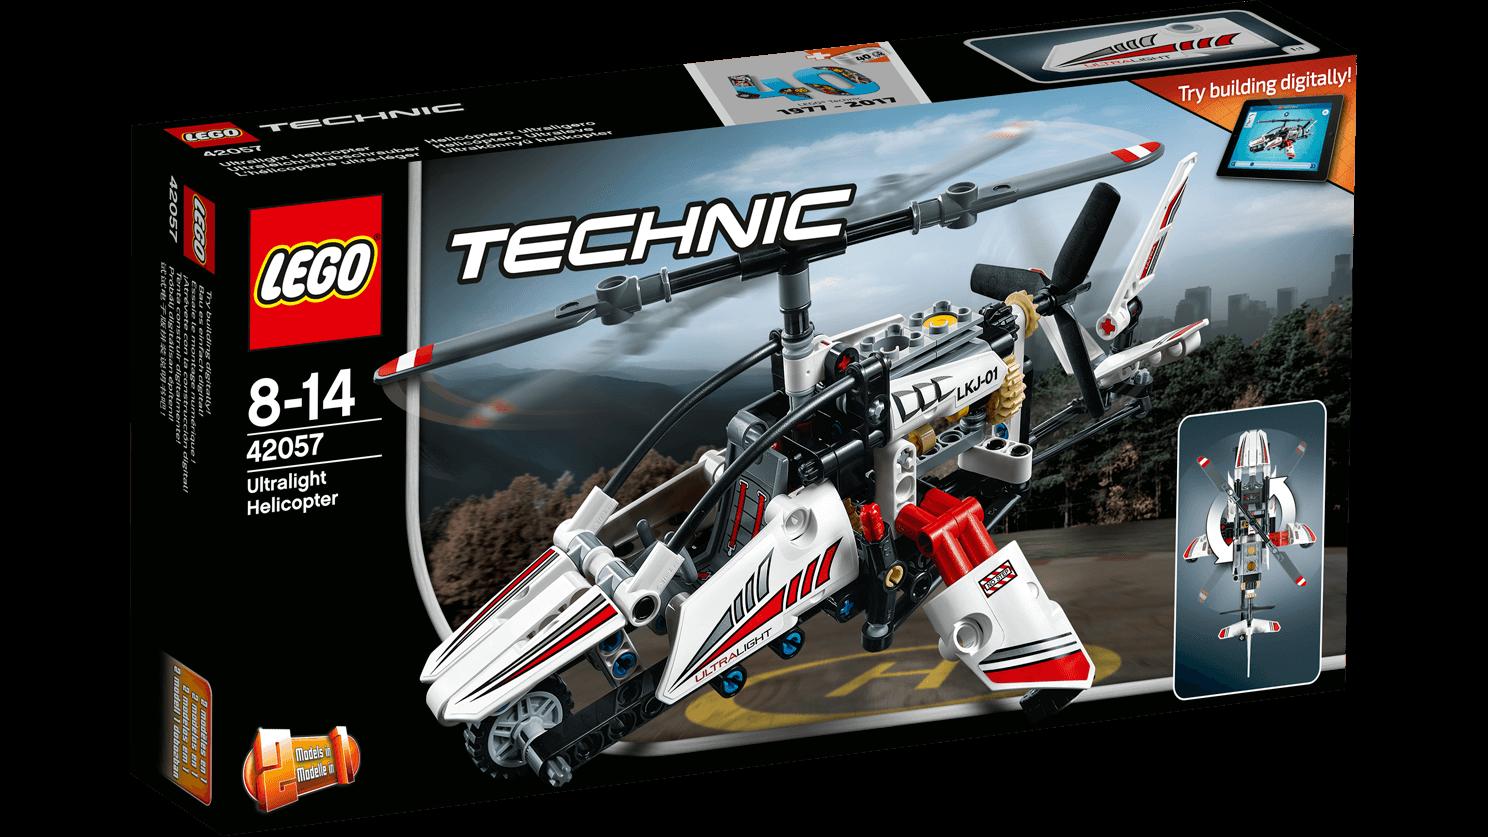 LEGO Technic 42057 Ultralight Helicopter LEGO konstruktors